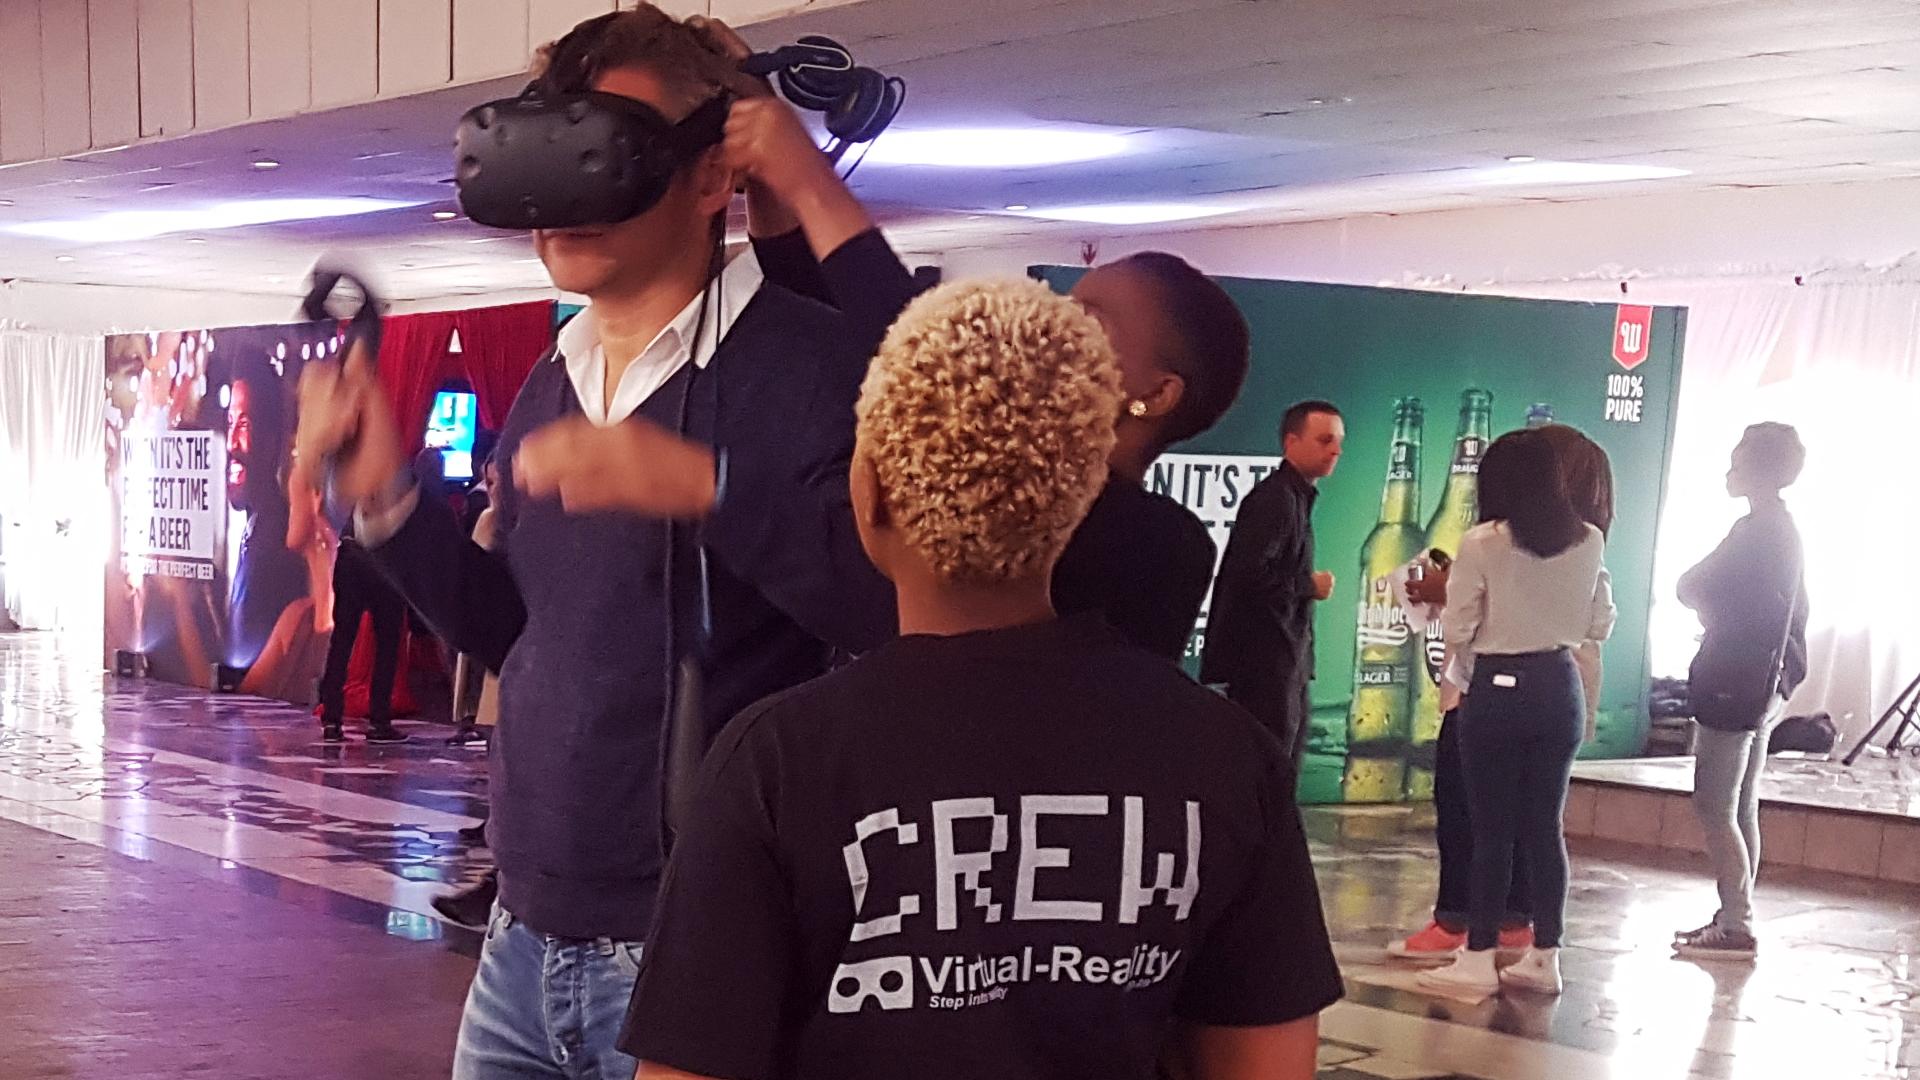 virtual-reality-events-pretoria